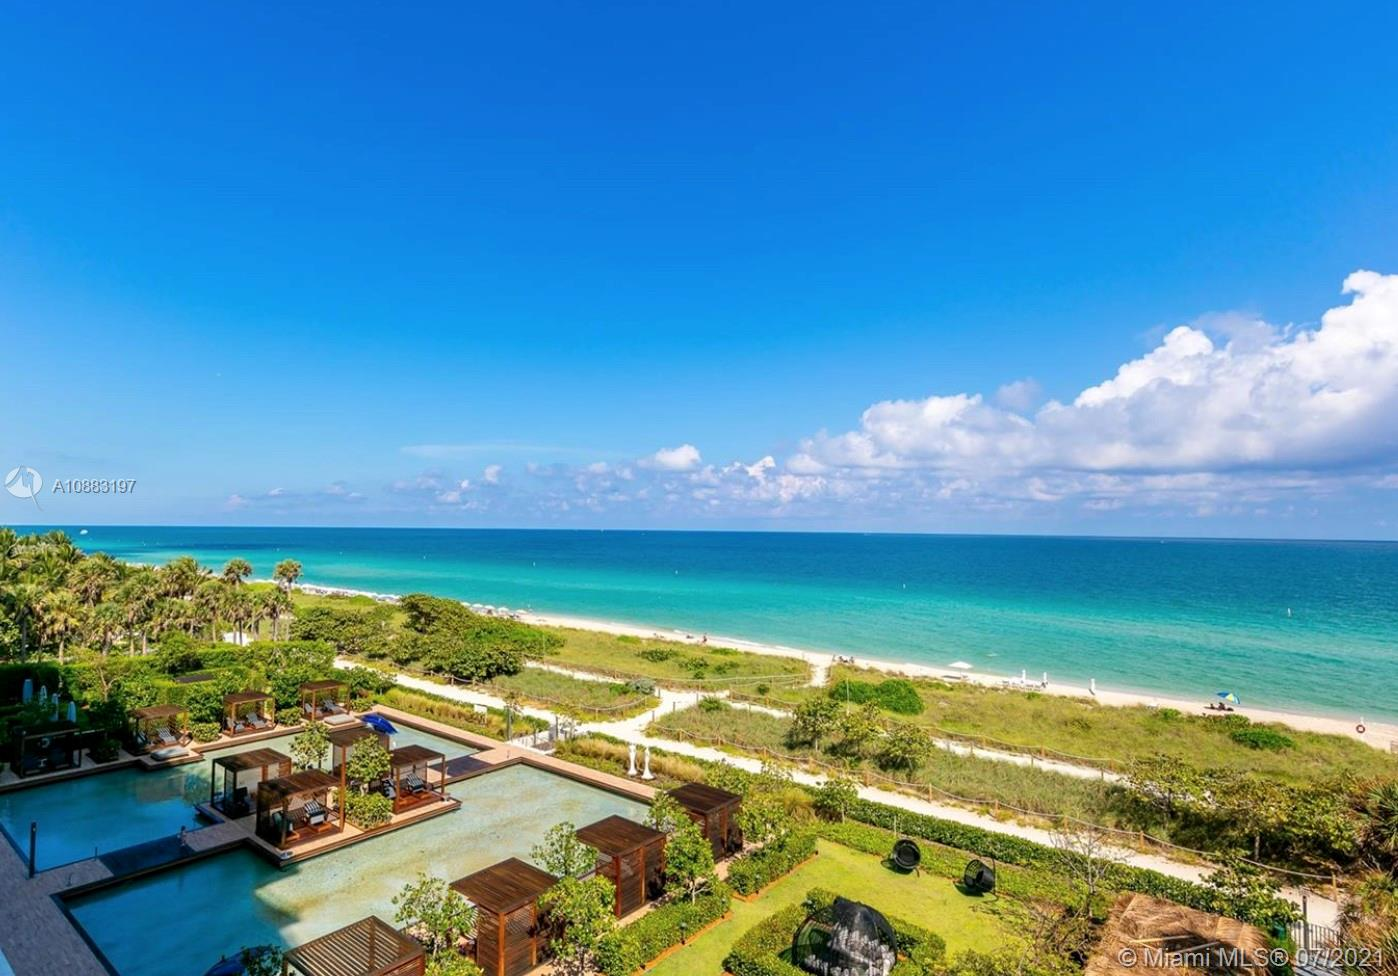 FENDI Chateau Residences, 9349 Collins Ave Unit 506, Surfside, Florida 33154, image 7